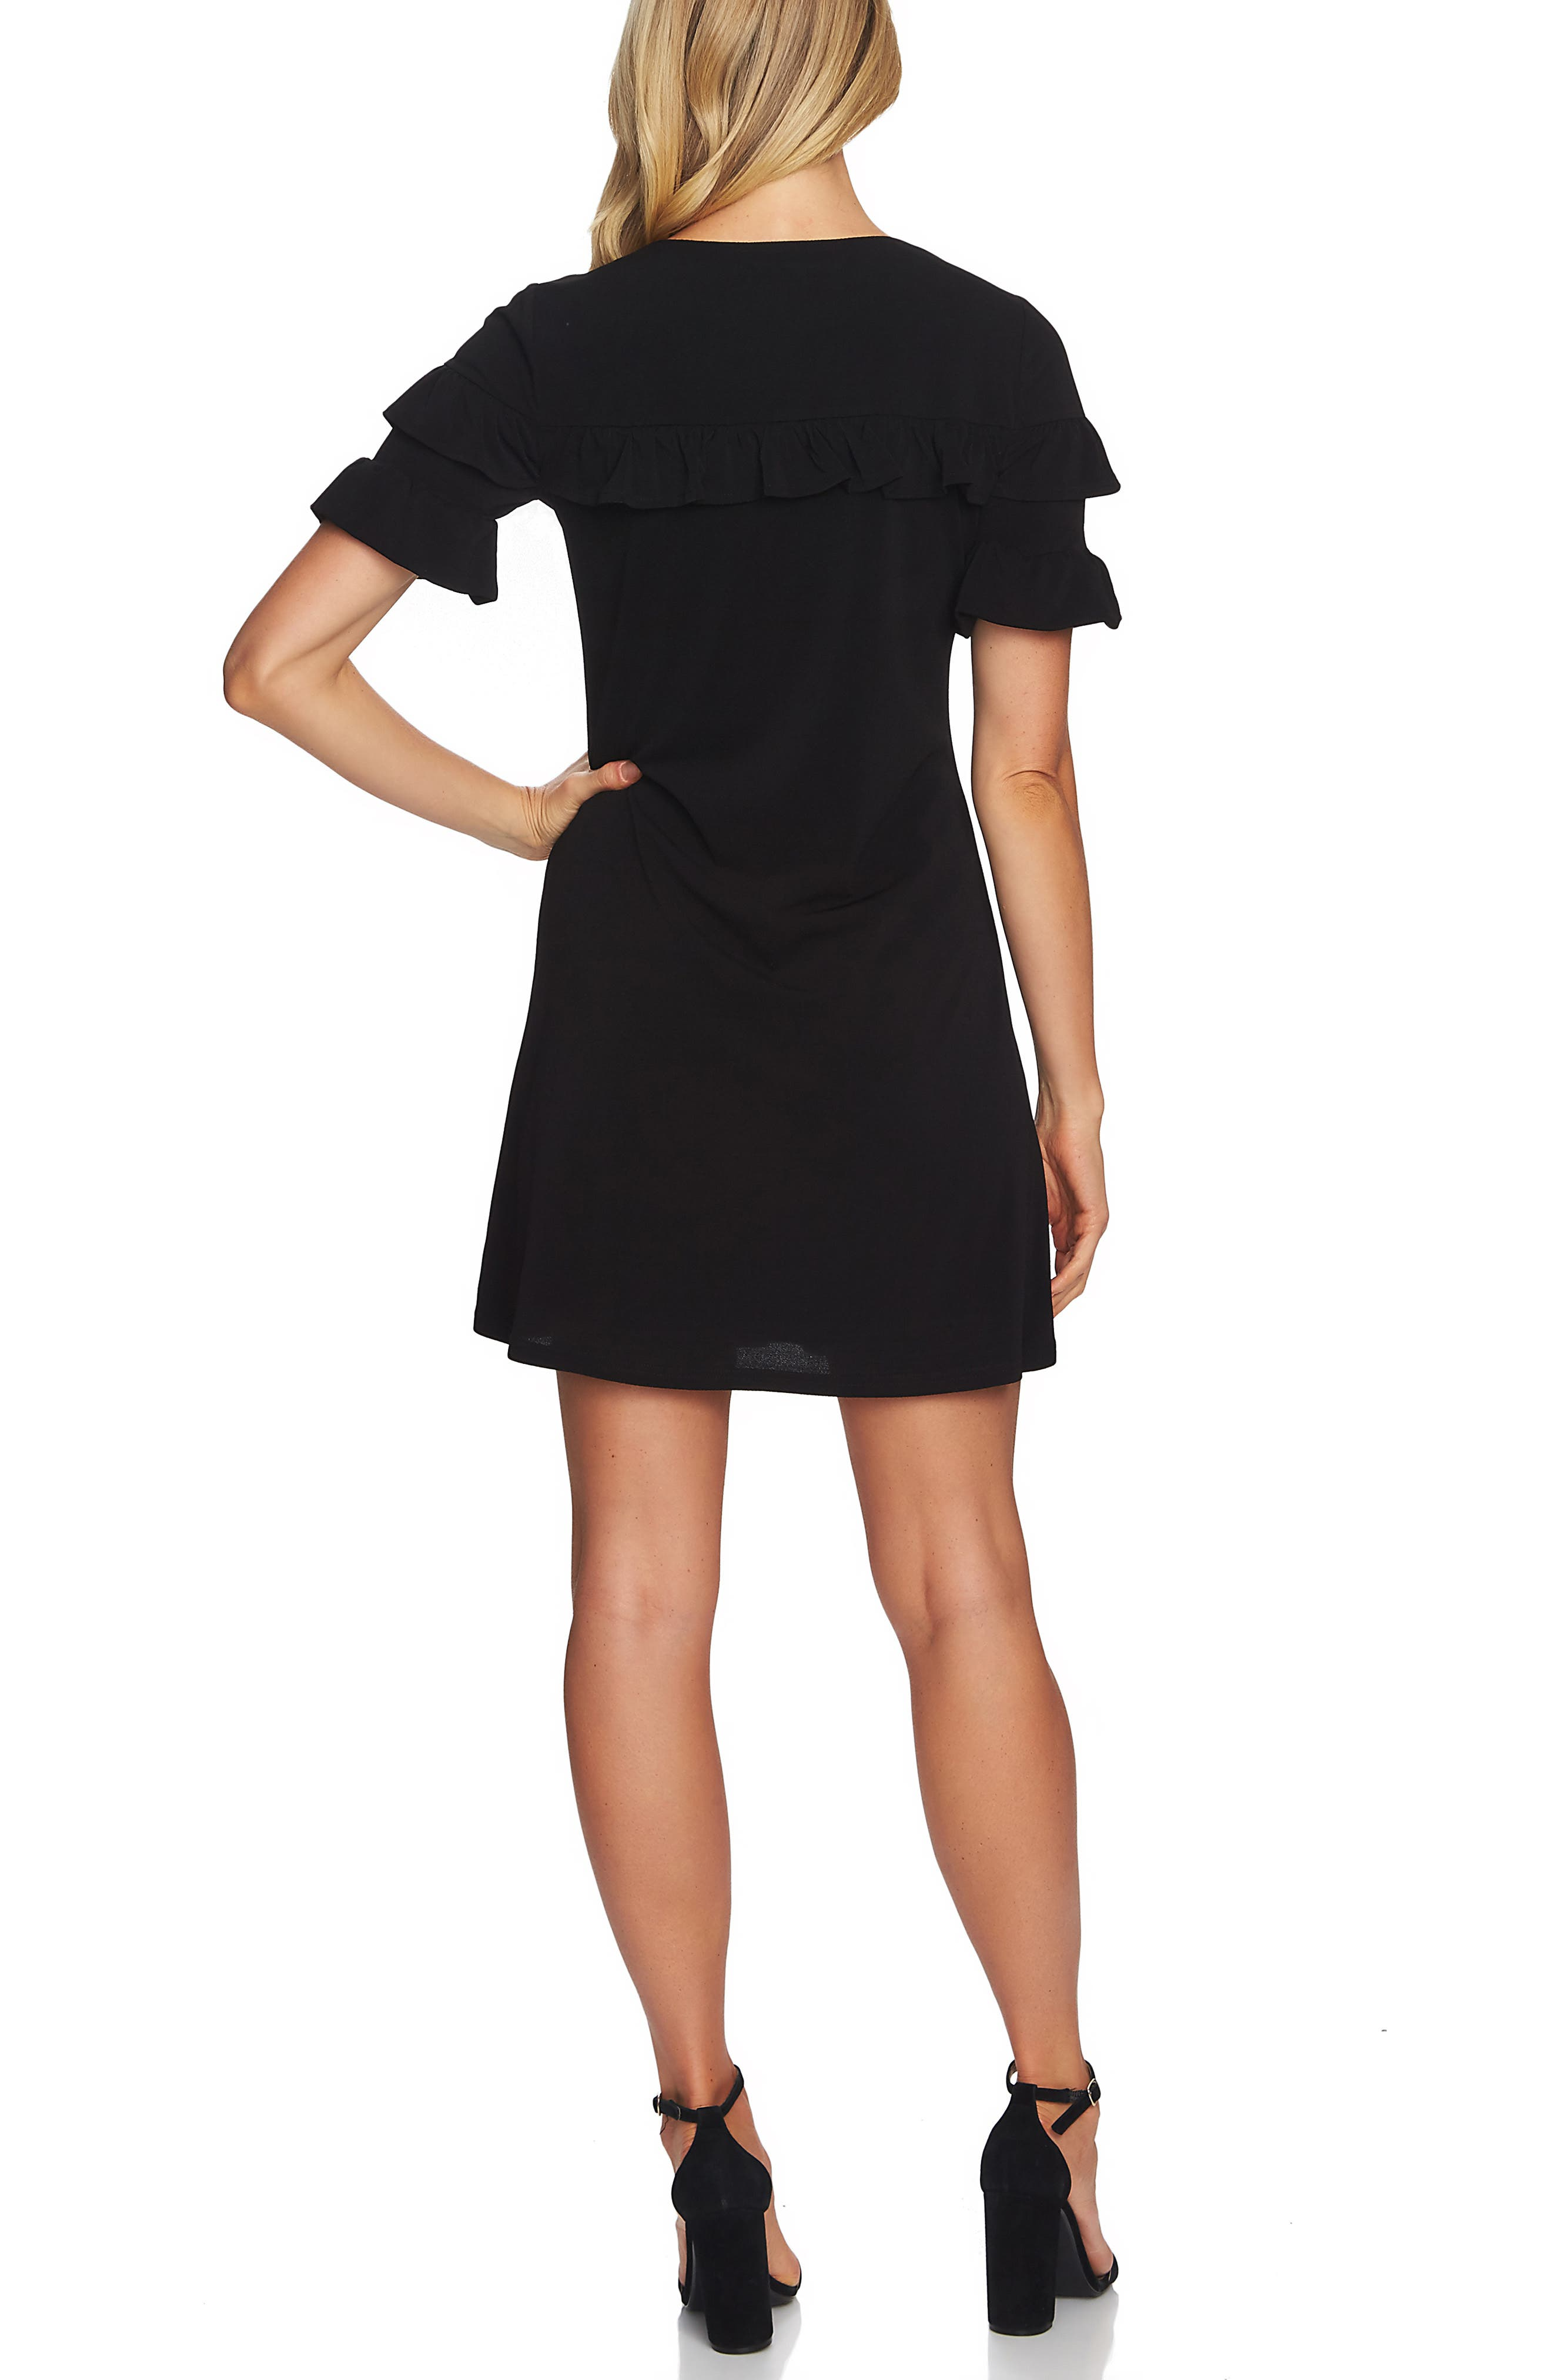 CECE,                             Ruffle Detail Short Sleeve Dress,                             Alternate thumbnail 2, color,                             RICH BLACK